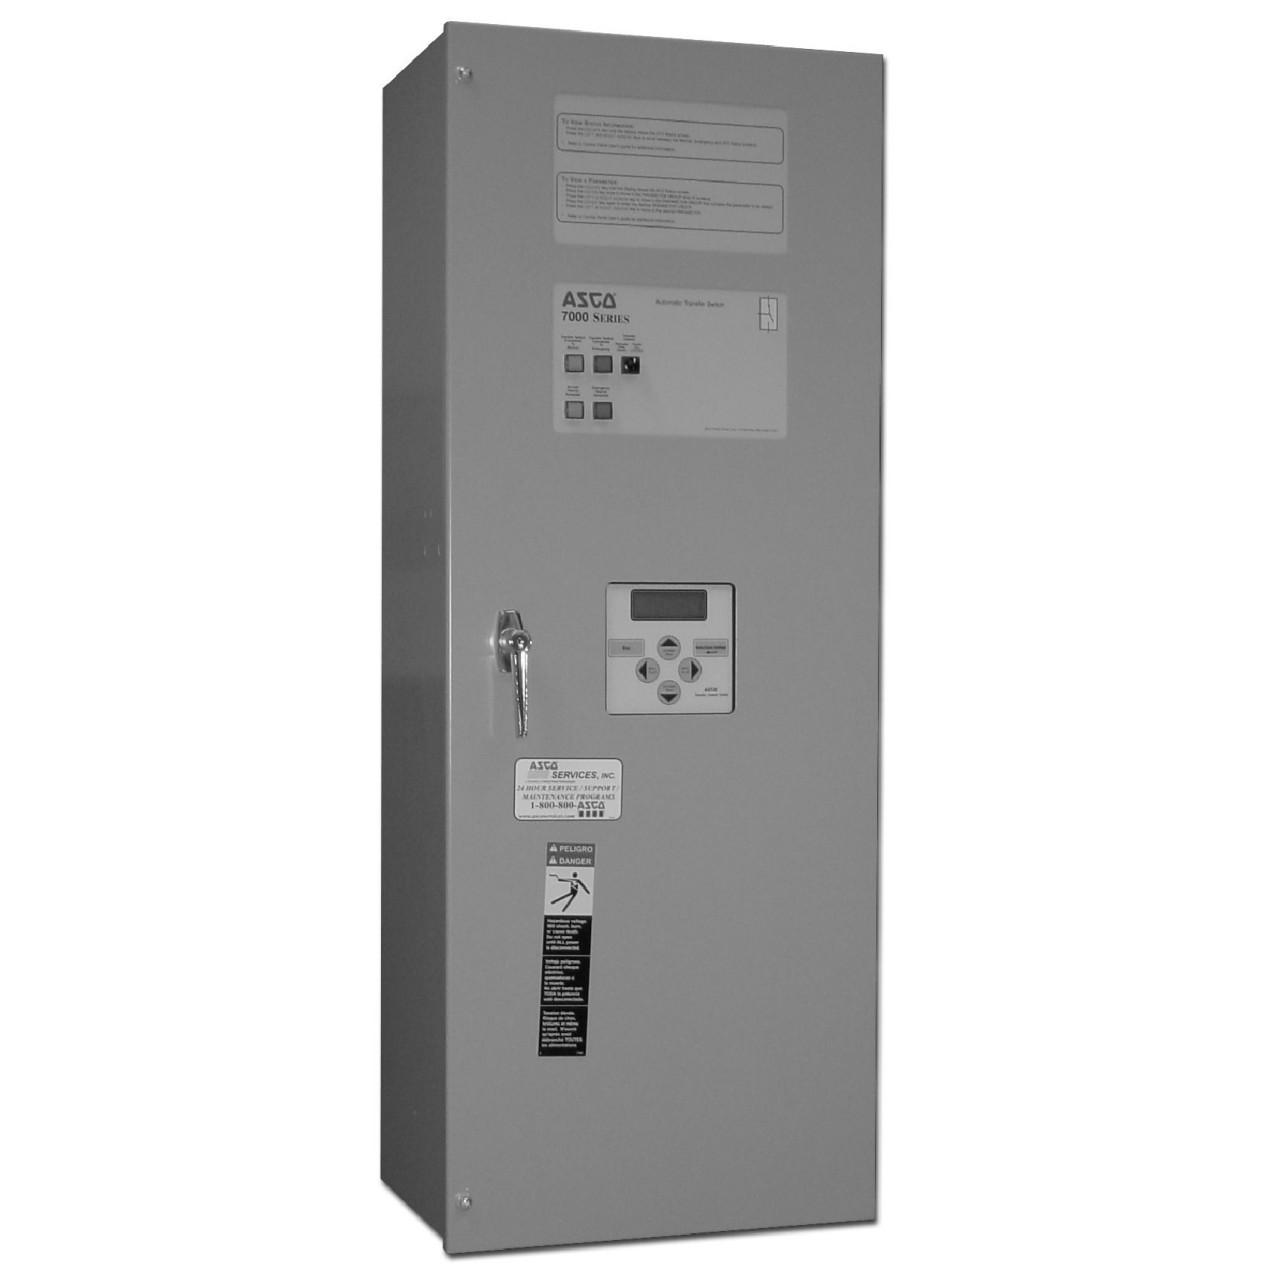 Asco 7000 Manual Transfer Switch (1Ph, 70A)